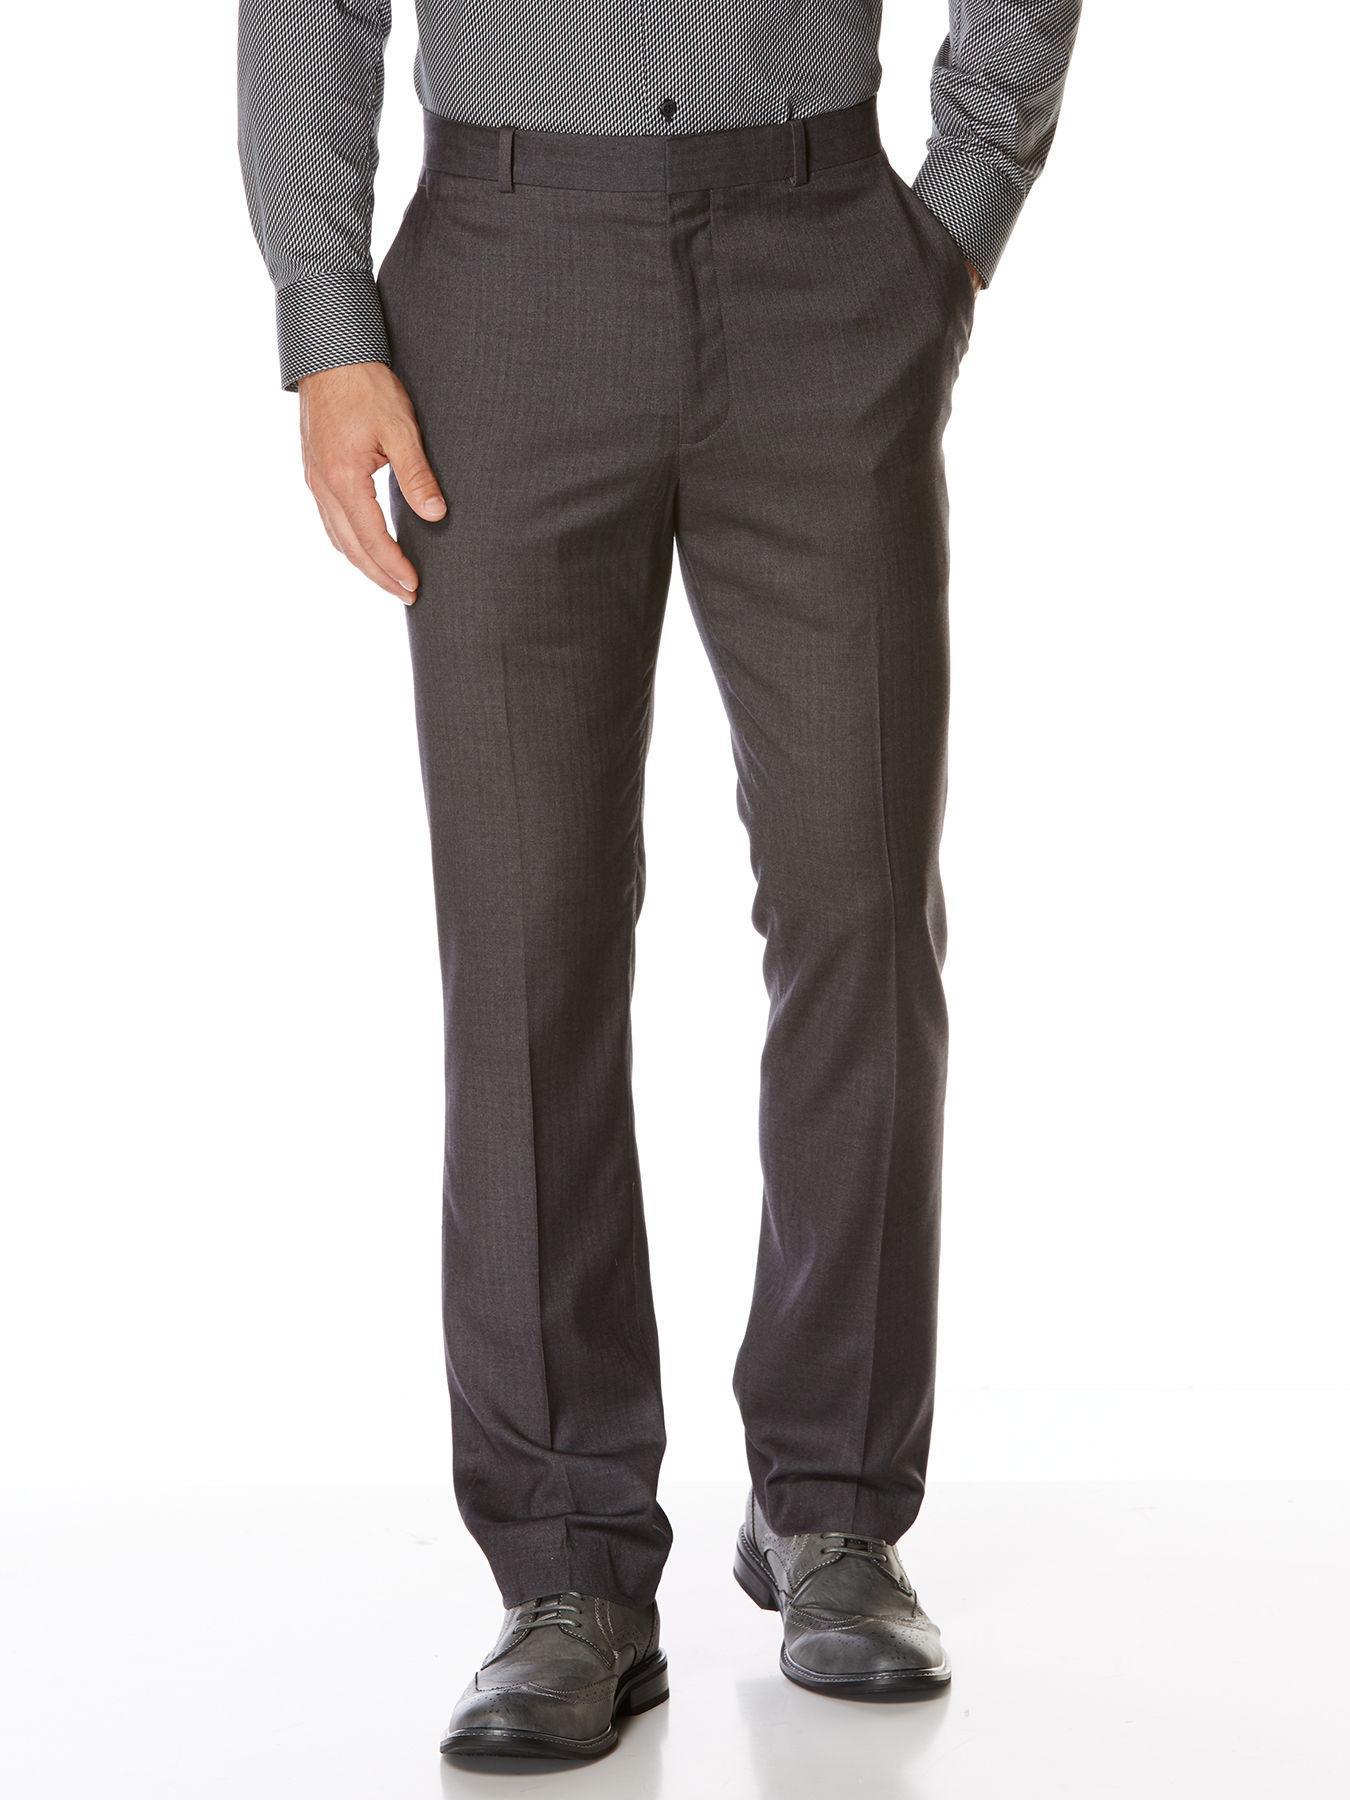 Perry Ellis Slim Fit Solid Portfolio Dress Pant In Gray